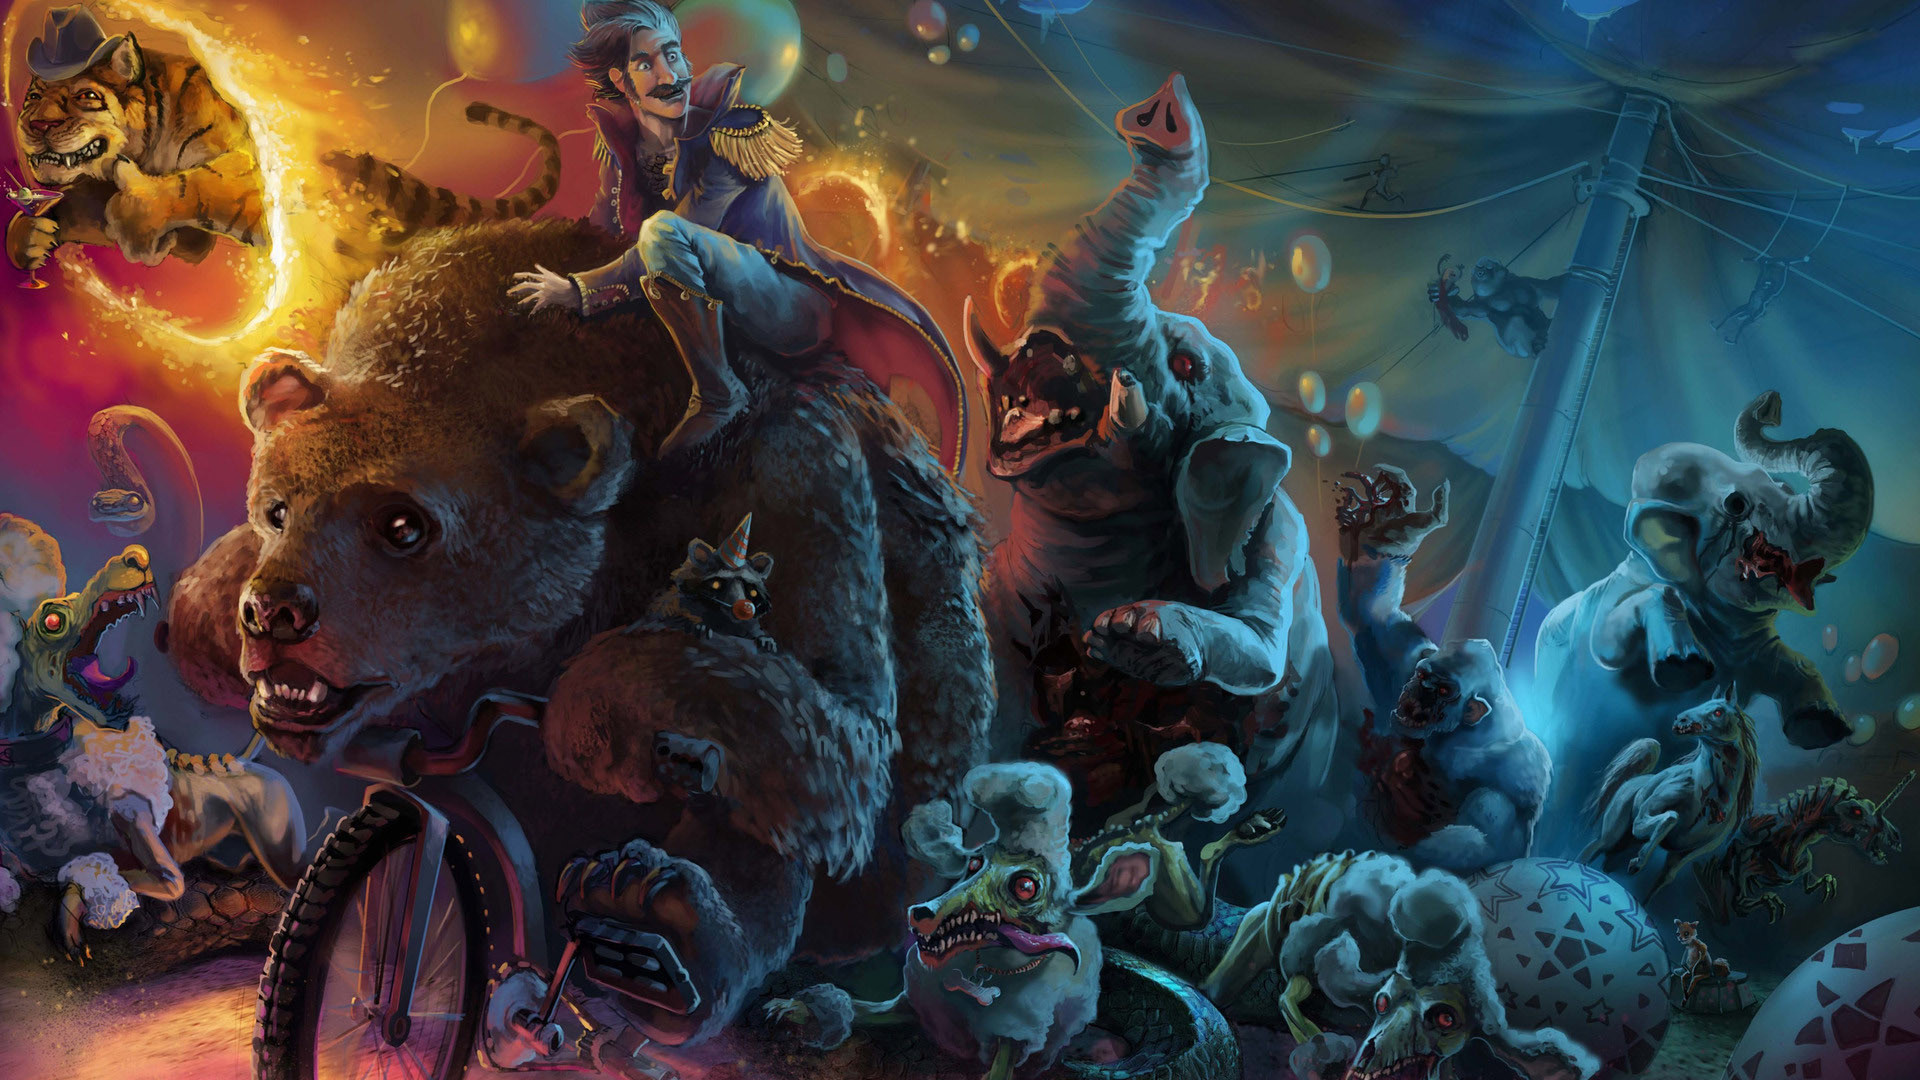 Dark circus animals fantasy wallpaper.